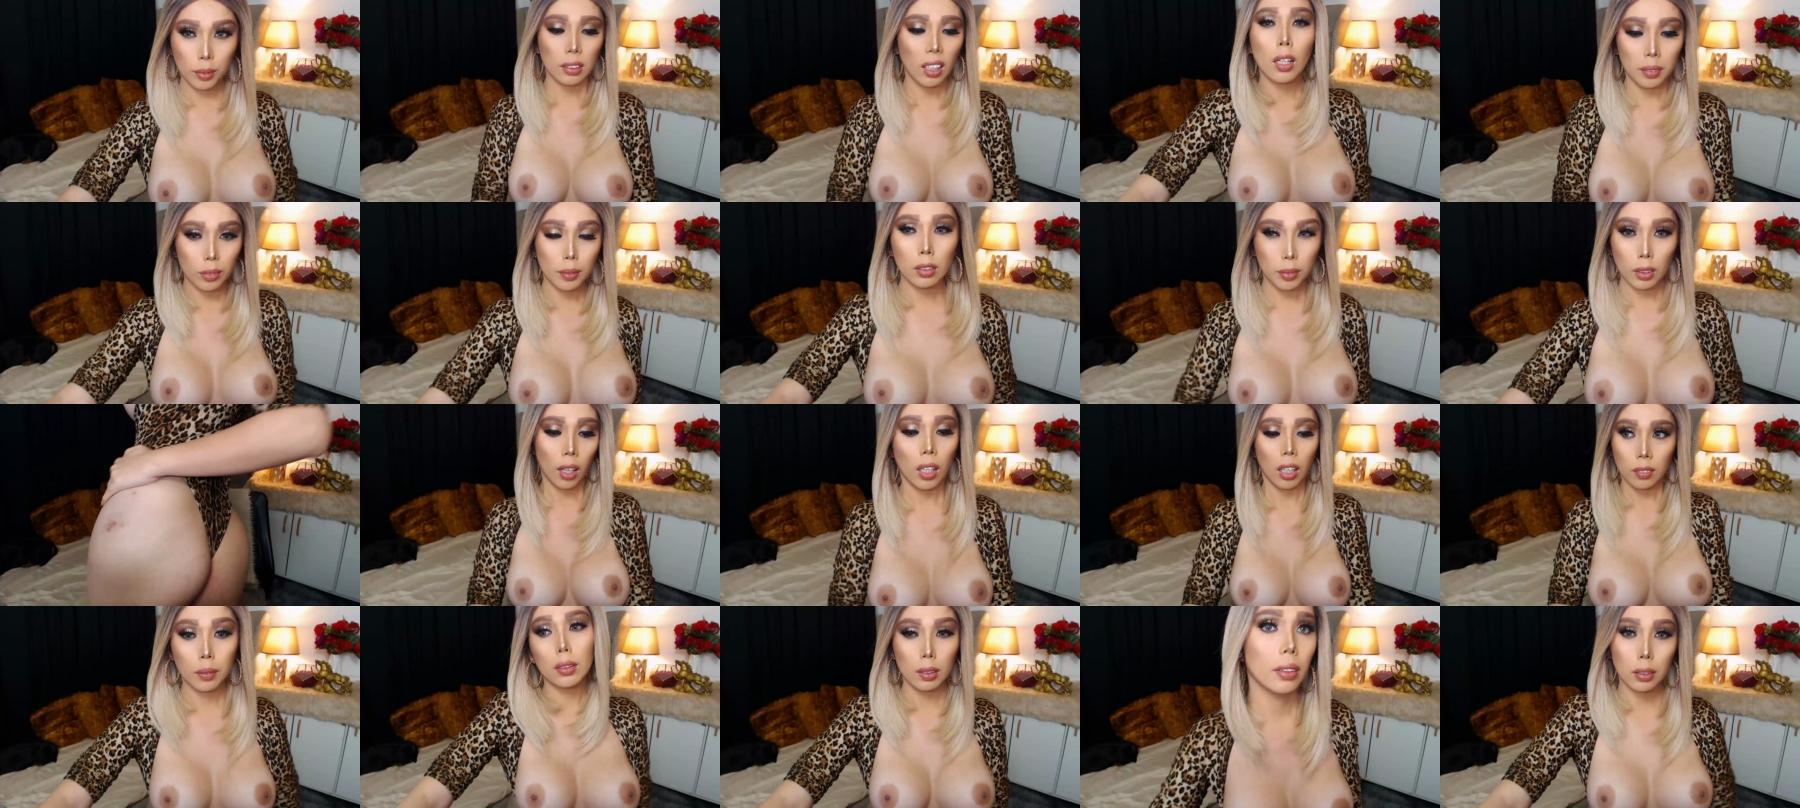 Selena_Boomshell ts 14-09-2021 Chaturbate